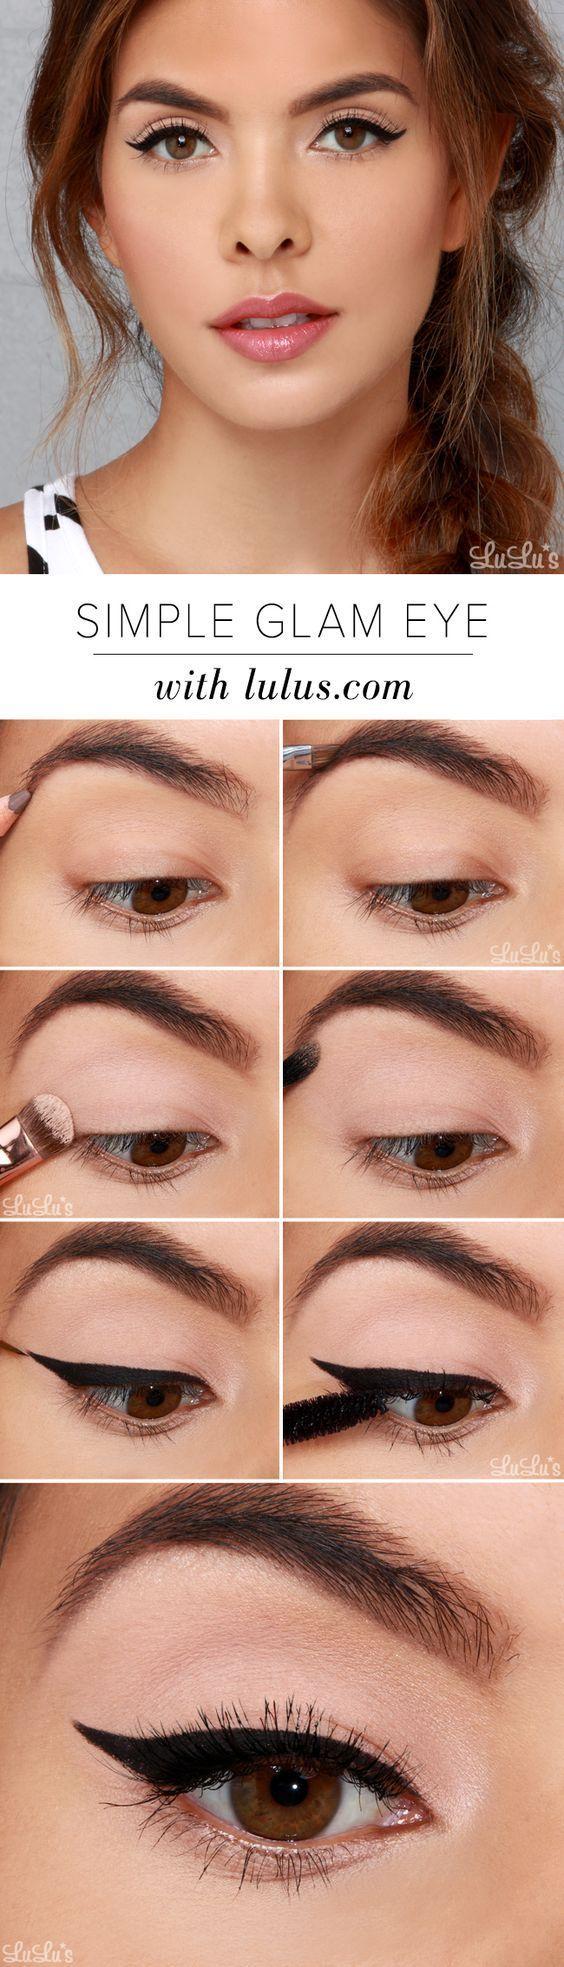 simple-glam-eye-makeup-for-brides via